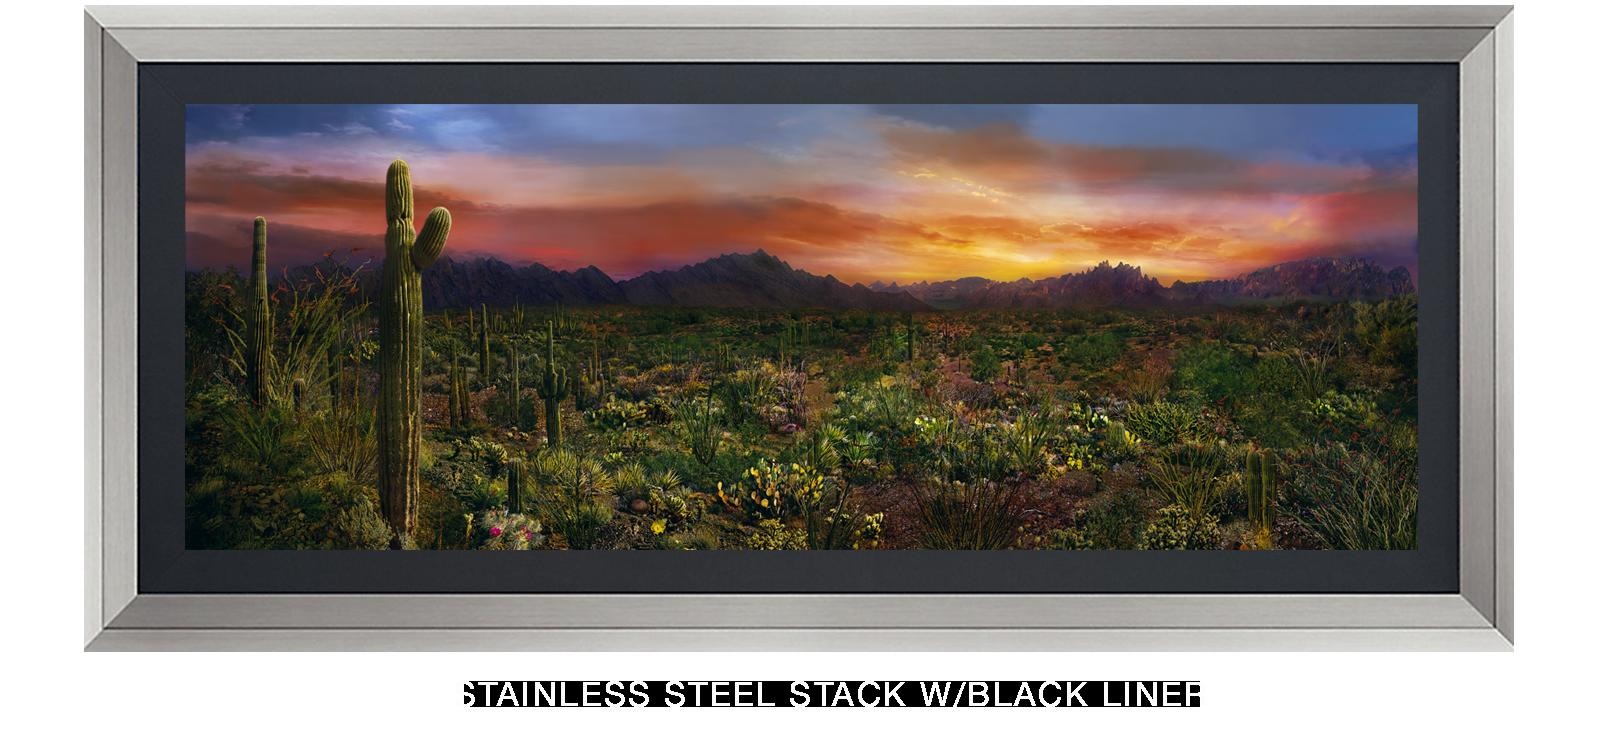 5EDEN VERNALIS Stainless Steel Stack w_Blk Liner T